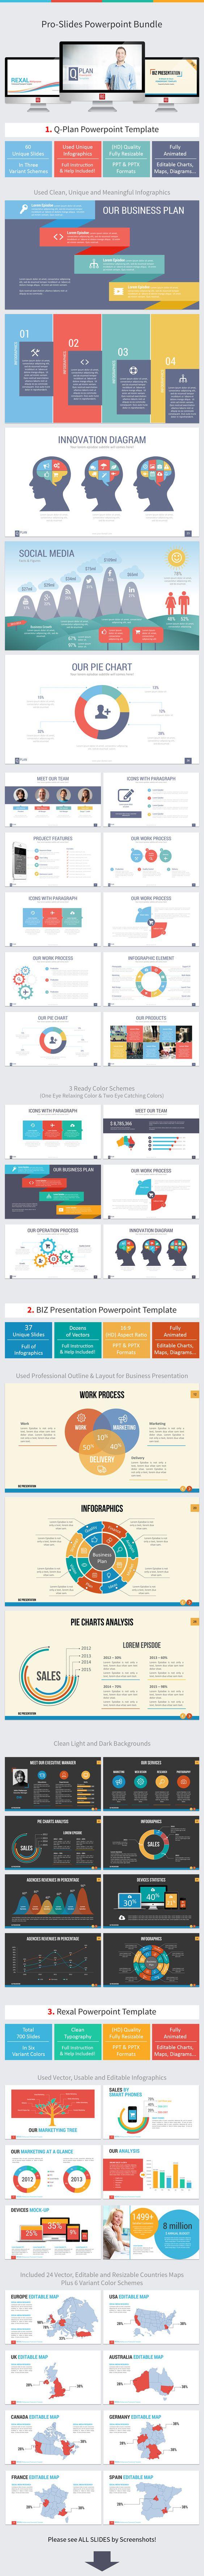 Resume presentation ppt free google powerpoint templates google drive resume templates alramifo Images